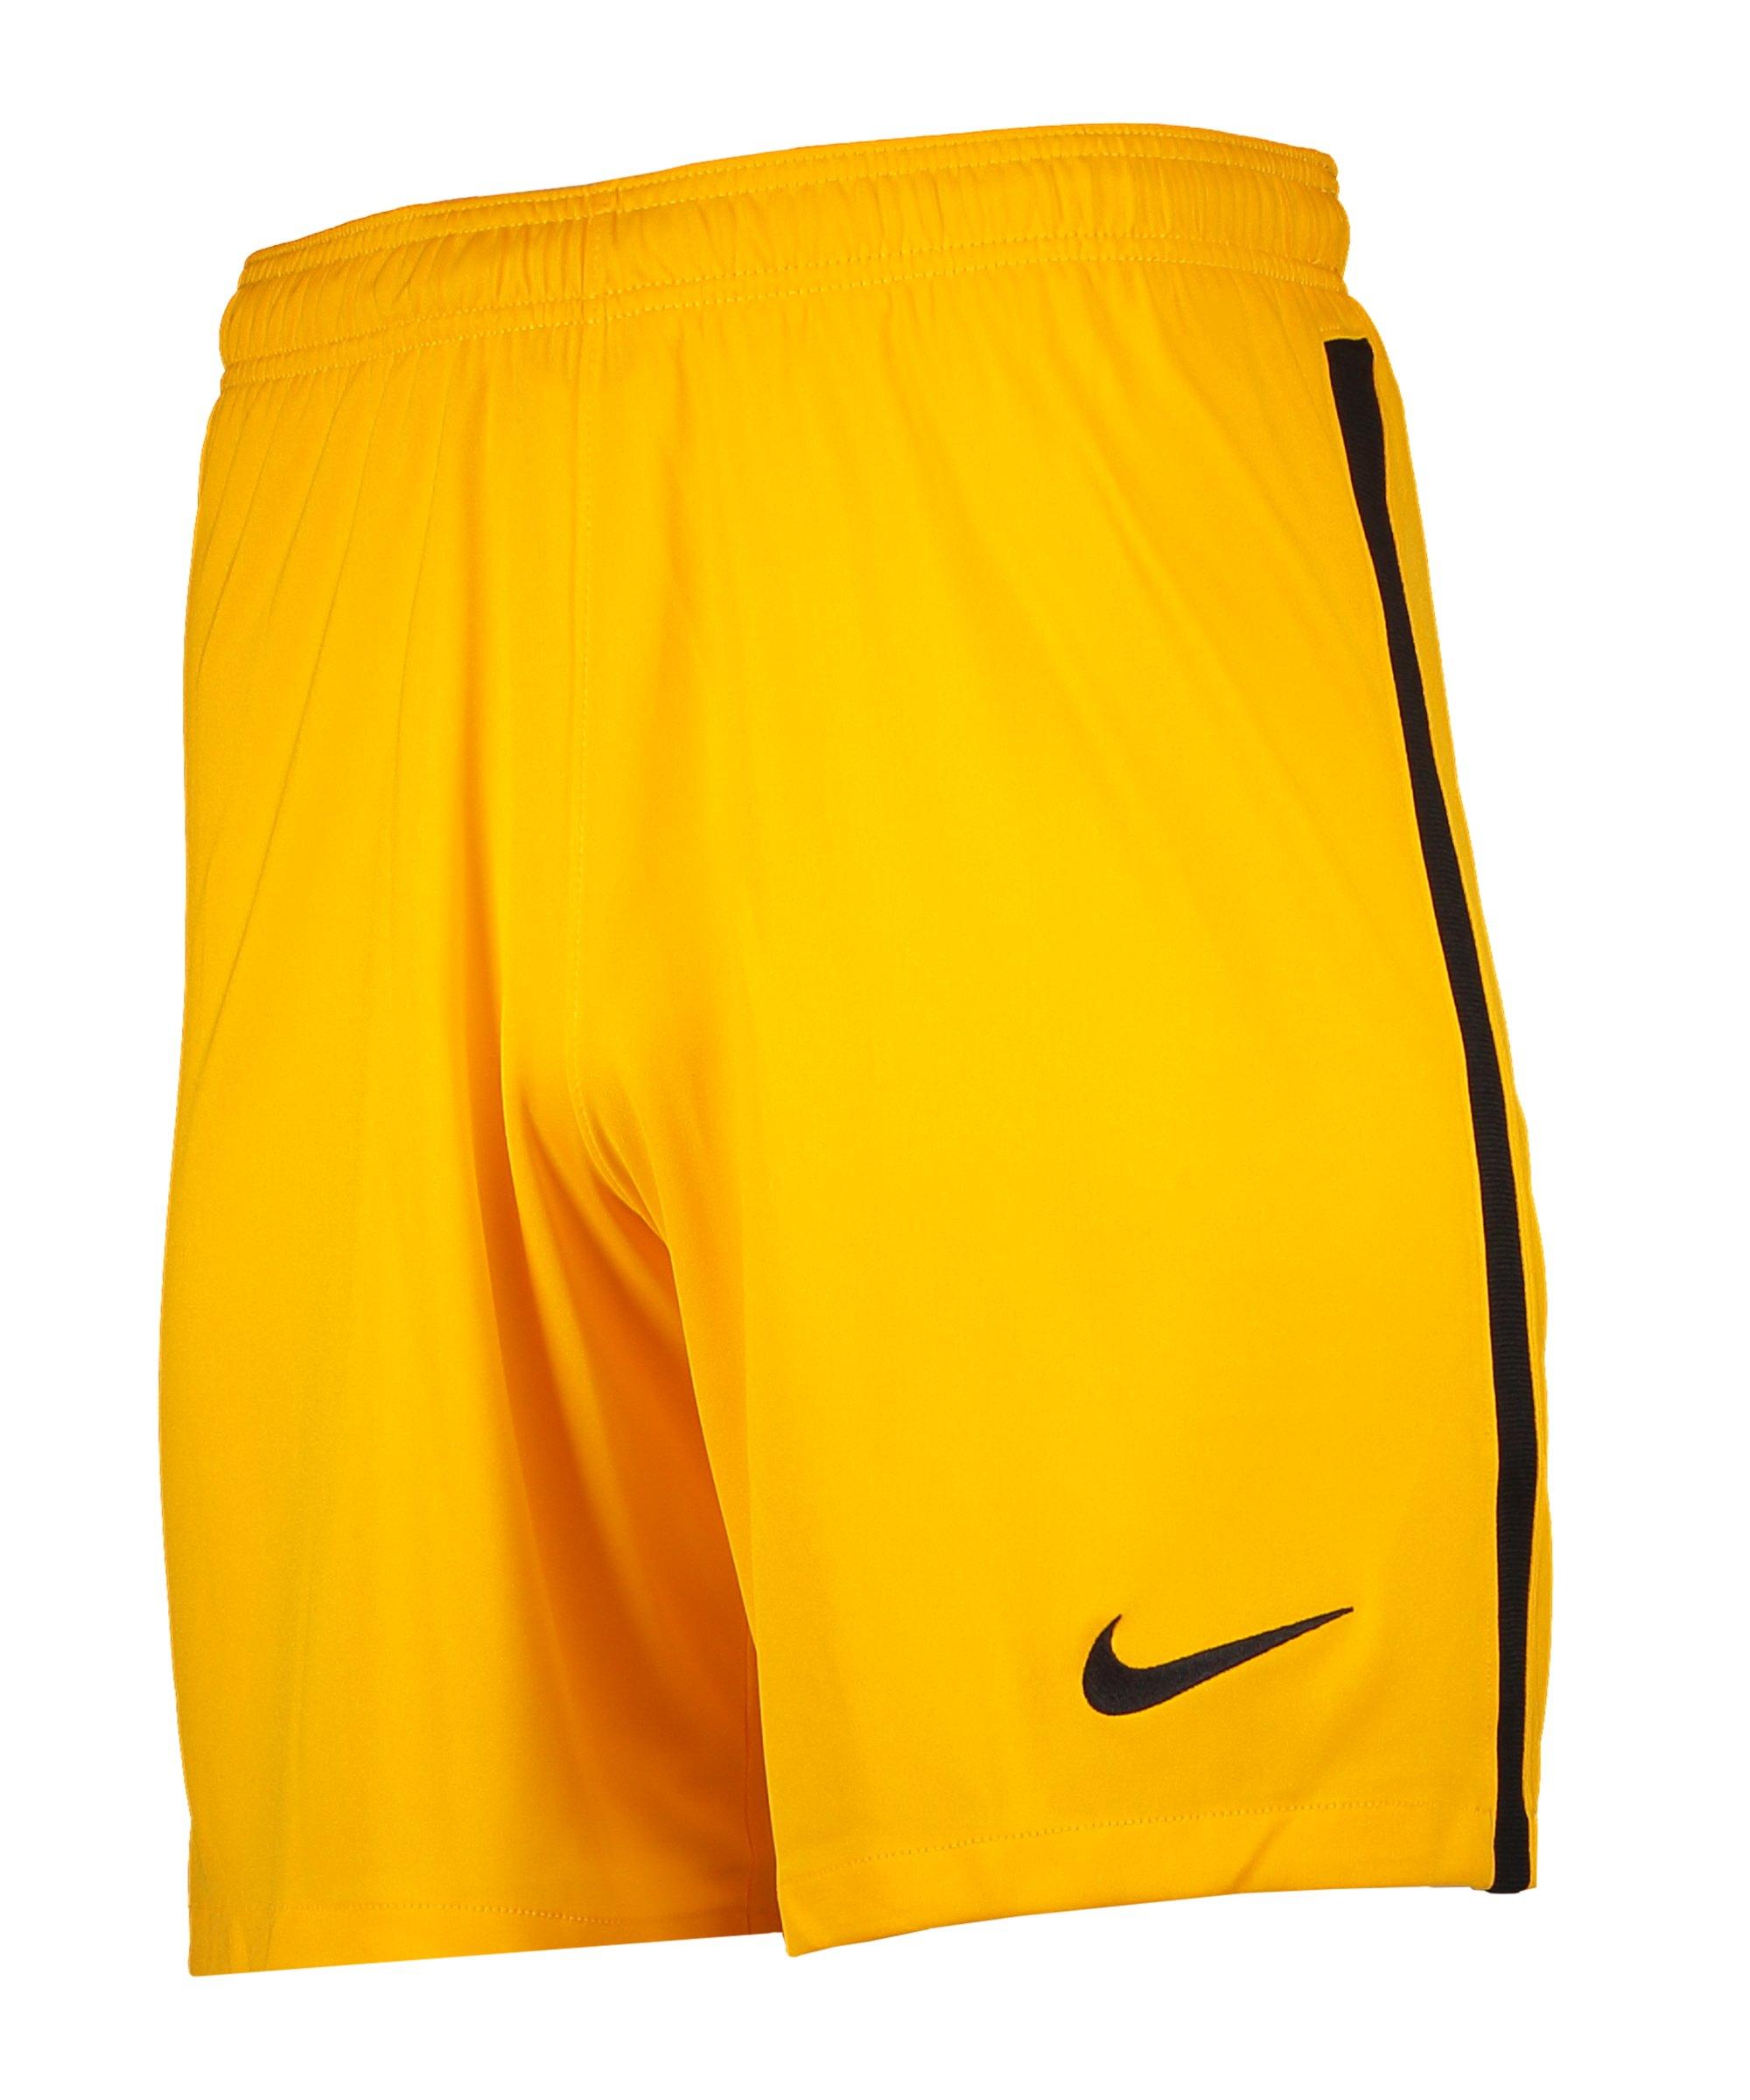 Nike Promo TW-Short Gold F739 - gold